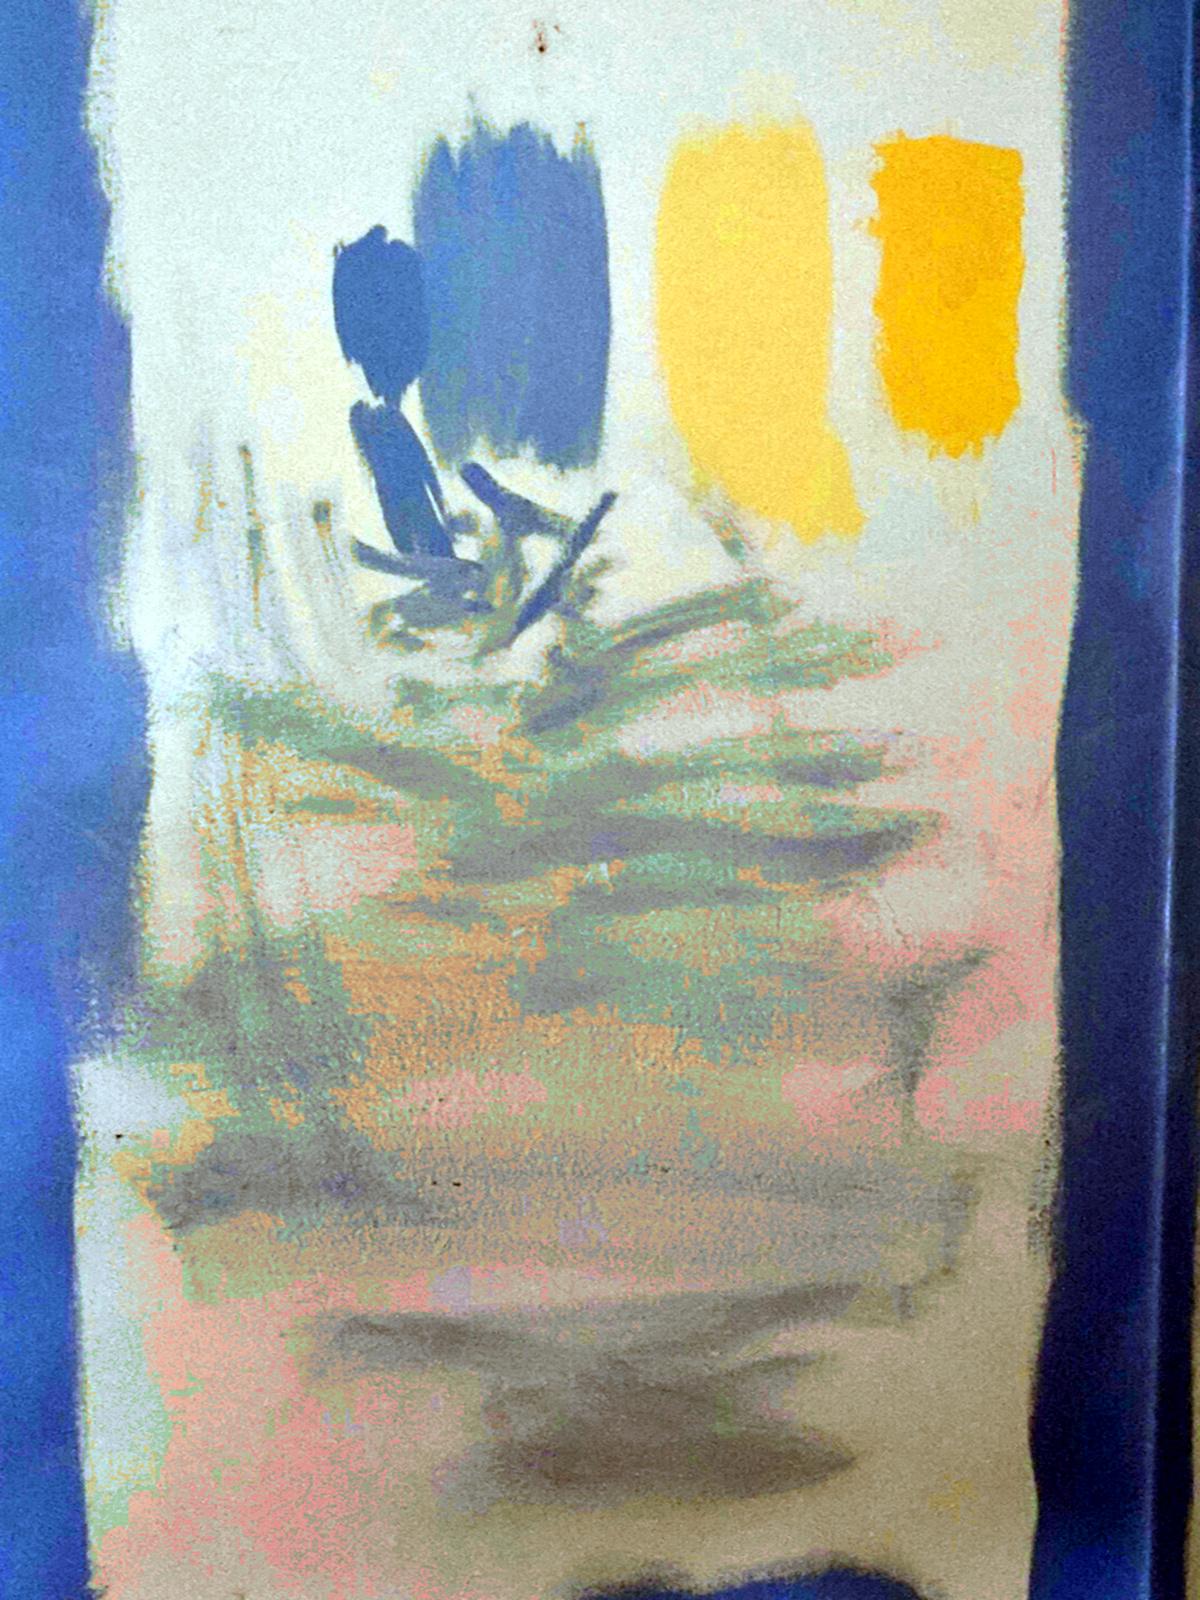 AbstractExpressionism-NancysStudy3b-levl-hue3.jpg